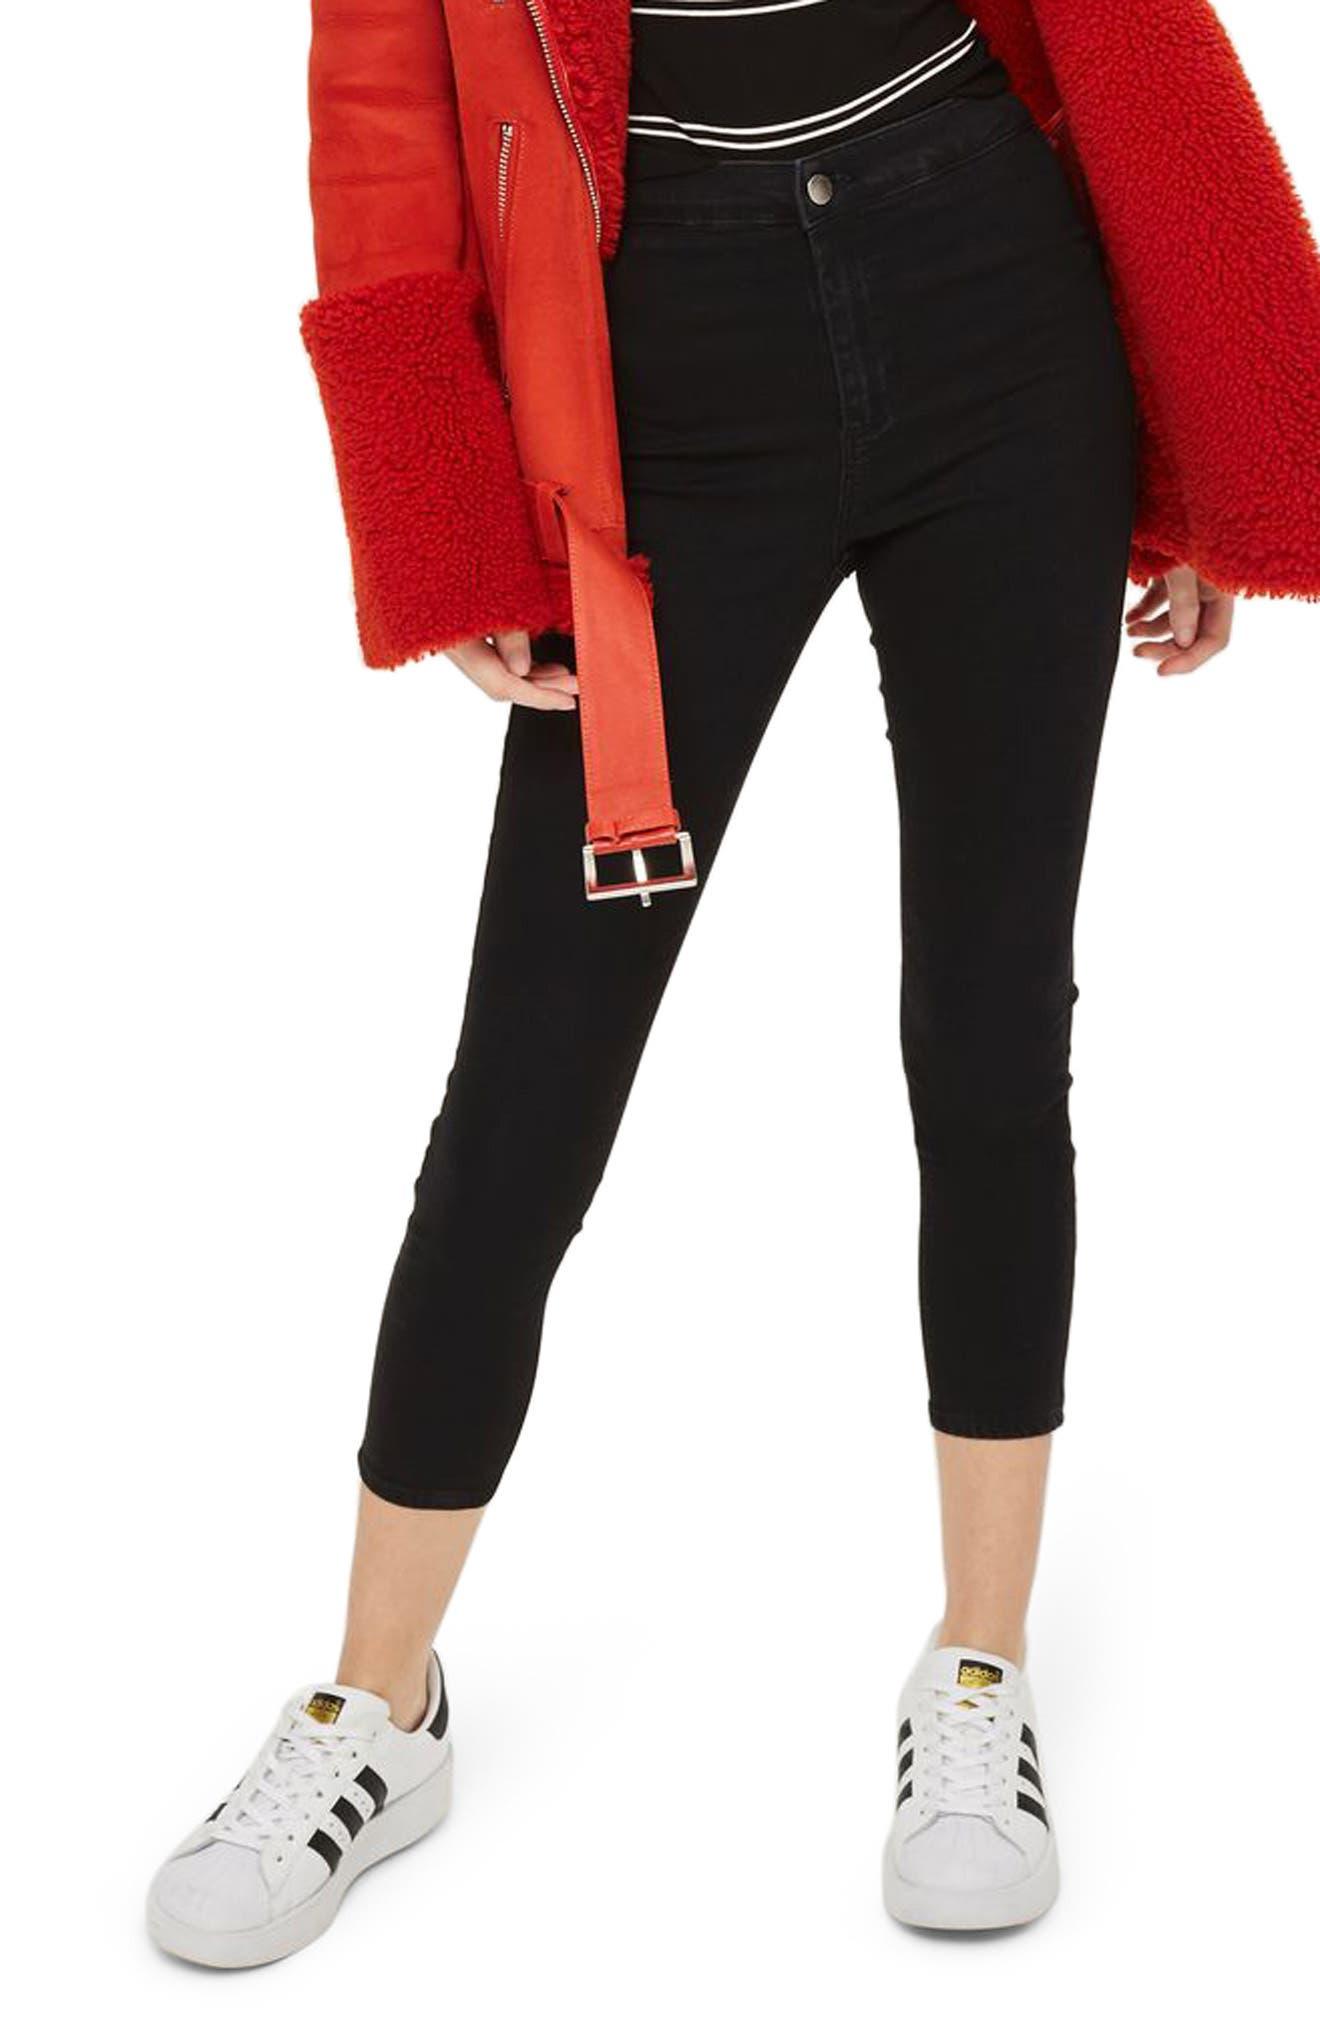 Alternate Image 1 Selected - Topshop Joni High Waist Crop Skinny Jeans (Petite)